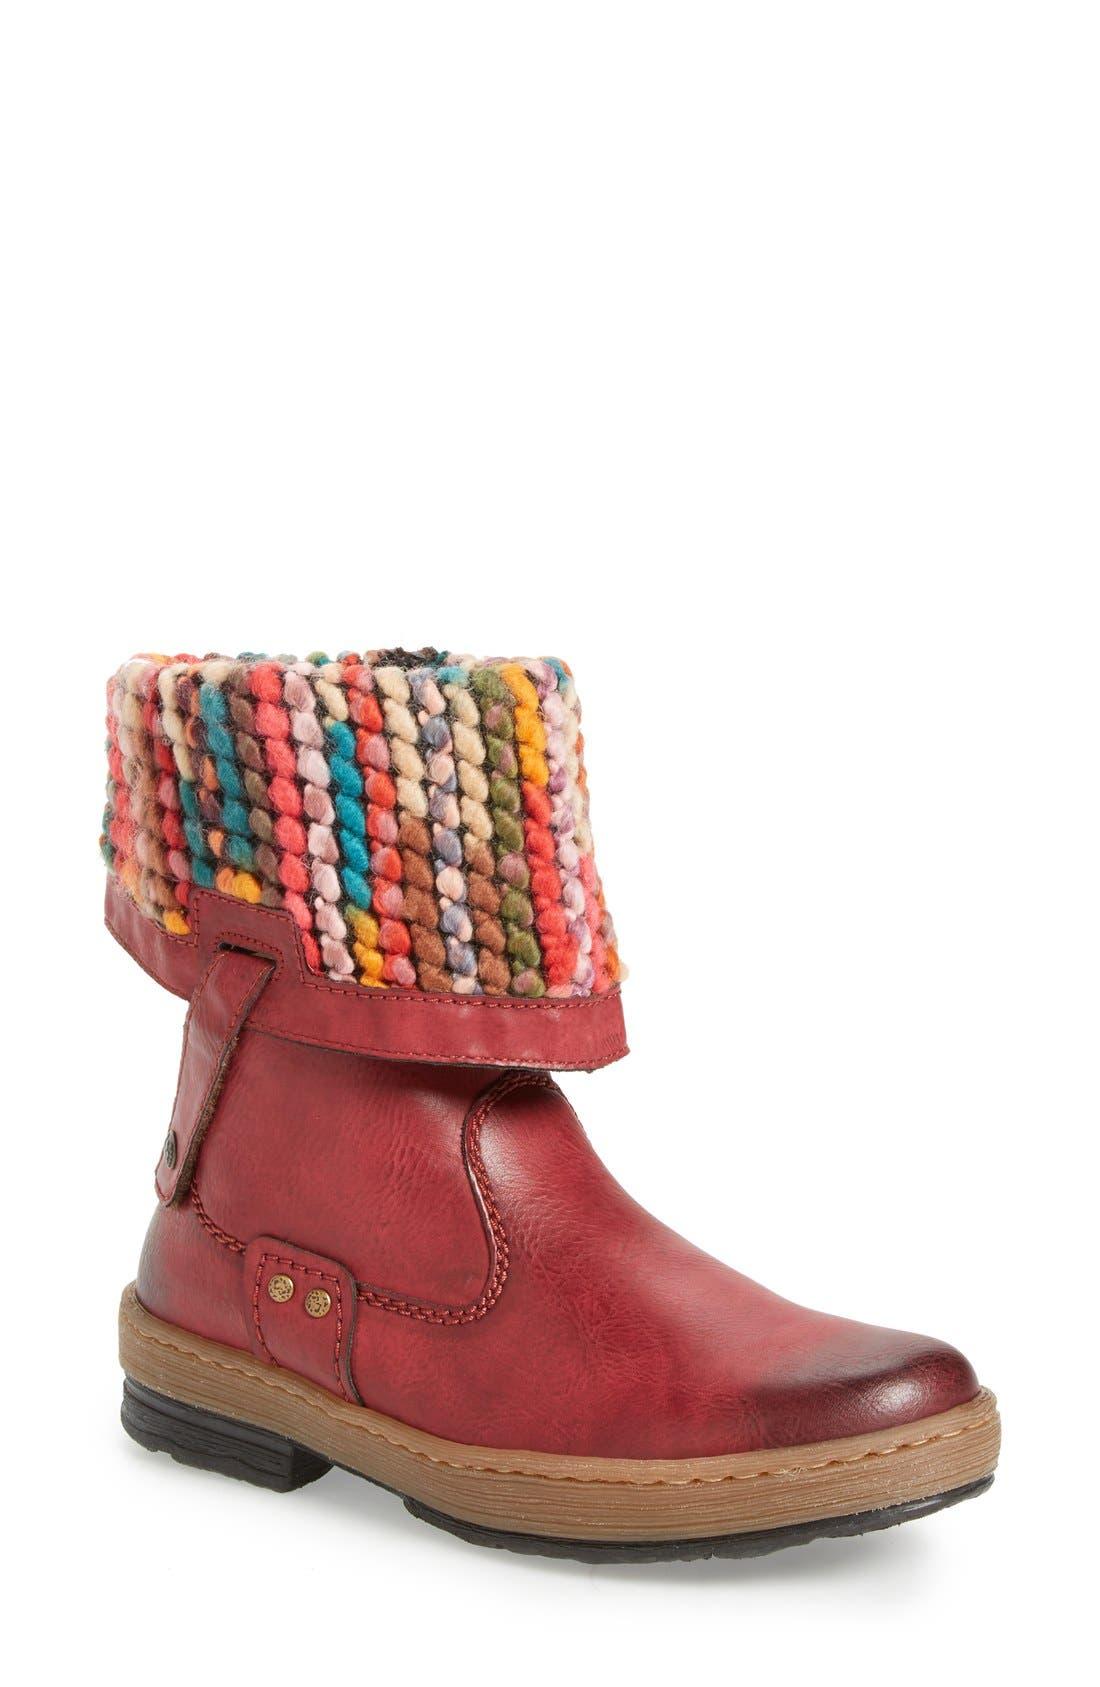 Main Image - Rieker Antistress 'Felicitas 98' Foldover Boot (Women)